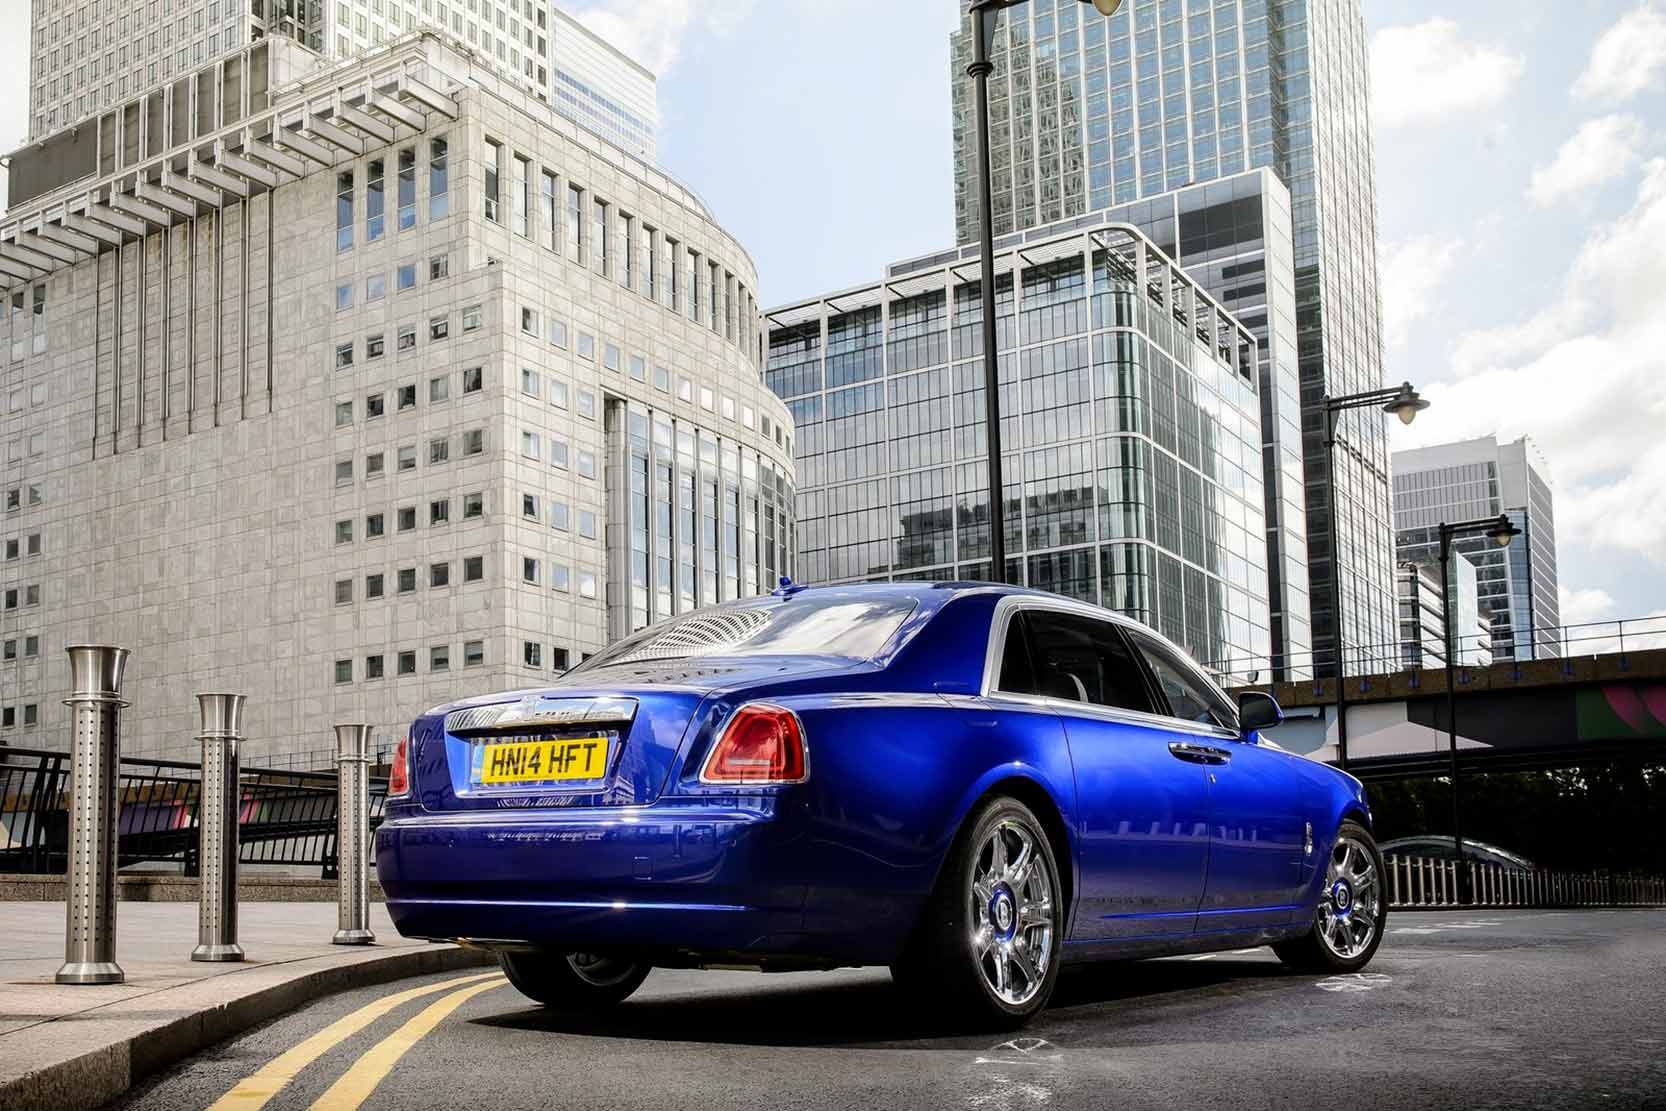 Fiche technique Rolls-Royce Ghost V12 2019